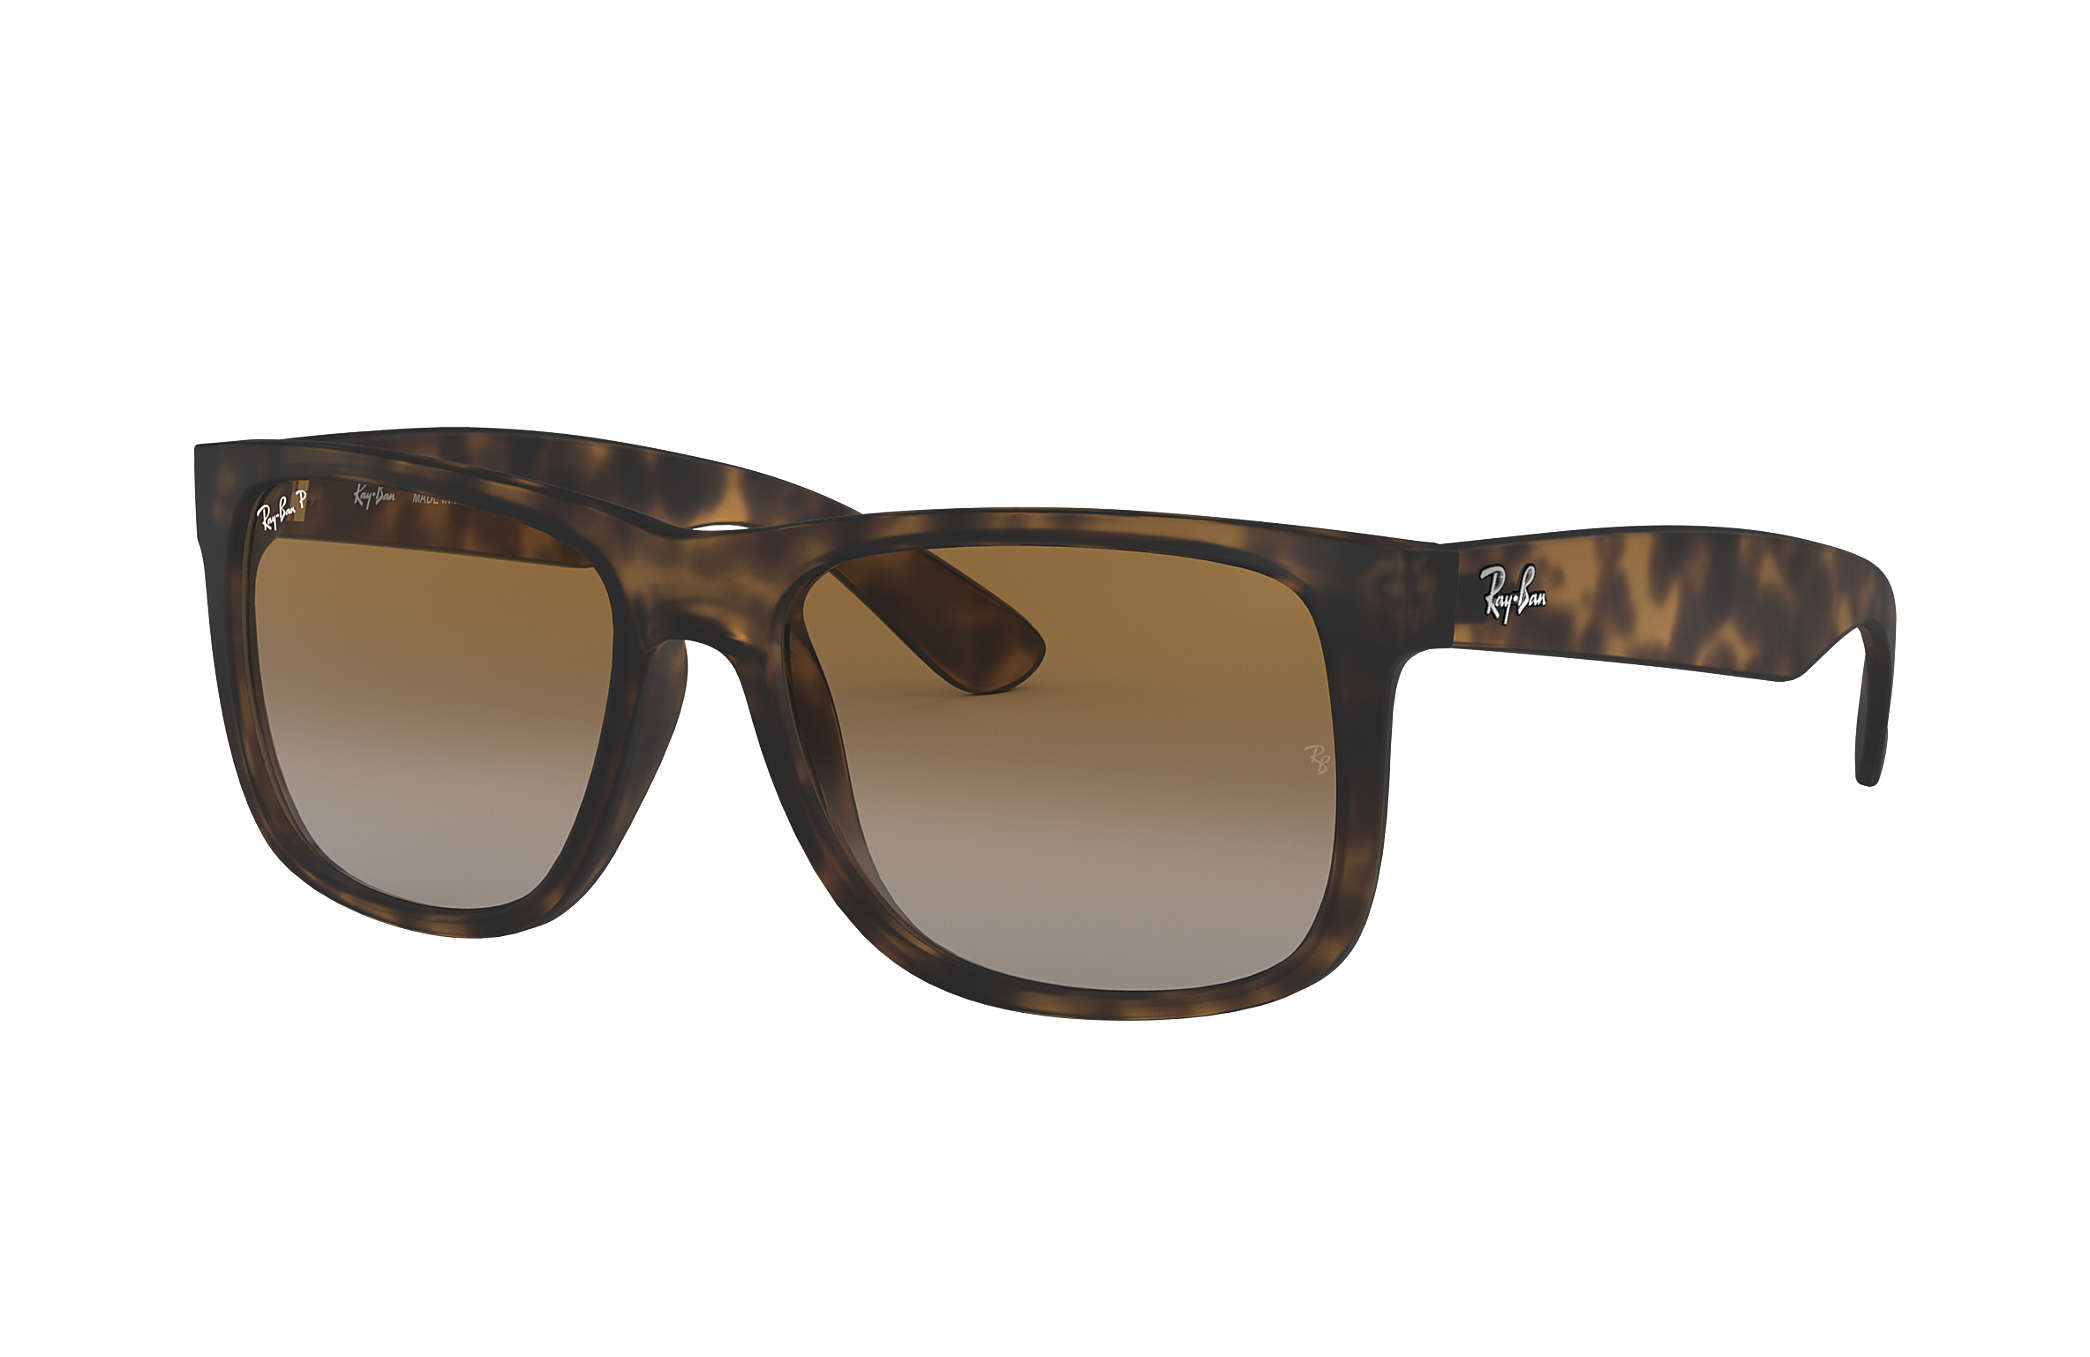 b92778faf1 Ray-Ban Justin Classic RB4165 Tortoise - Nylon - Brown Polarized ...